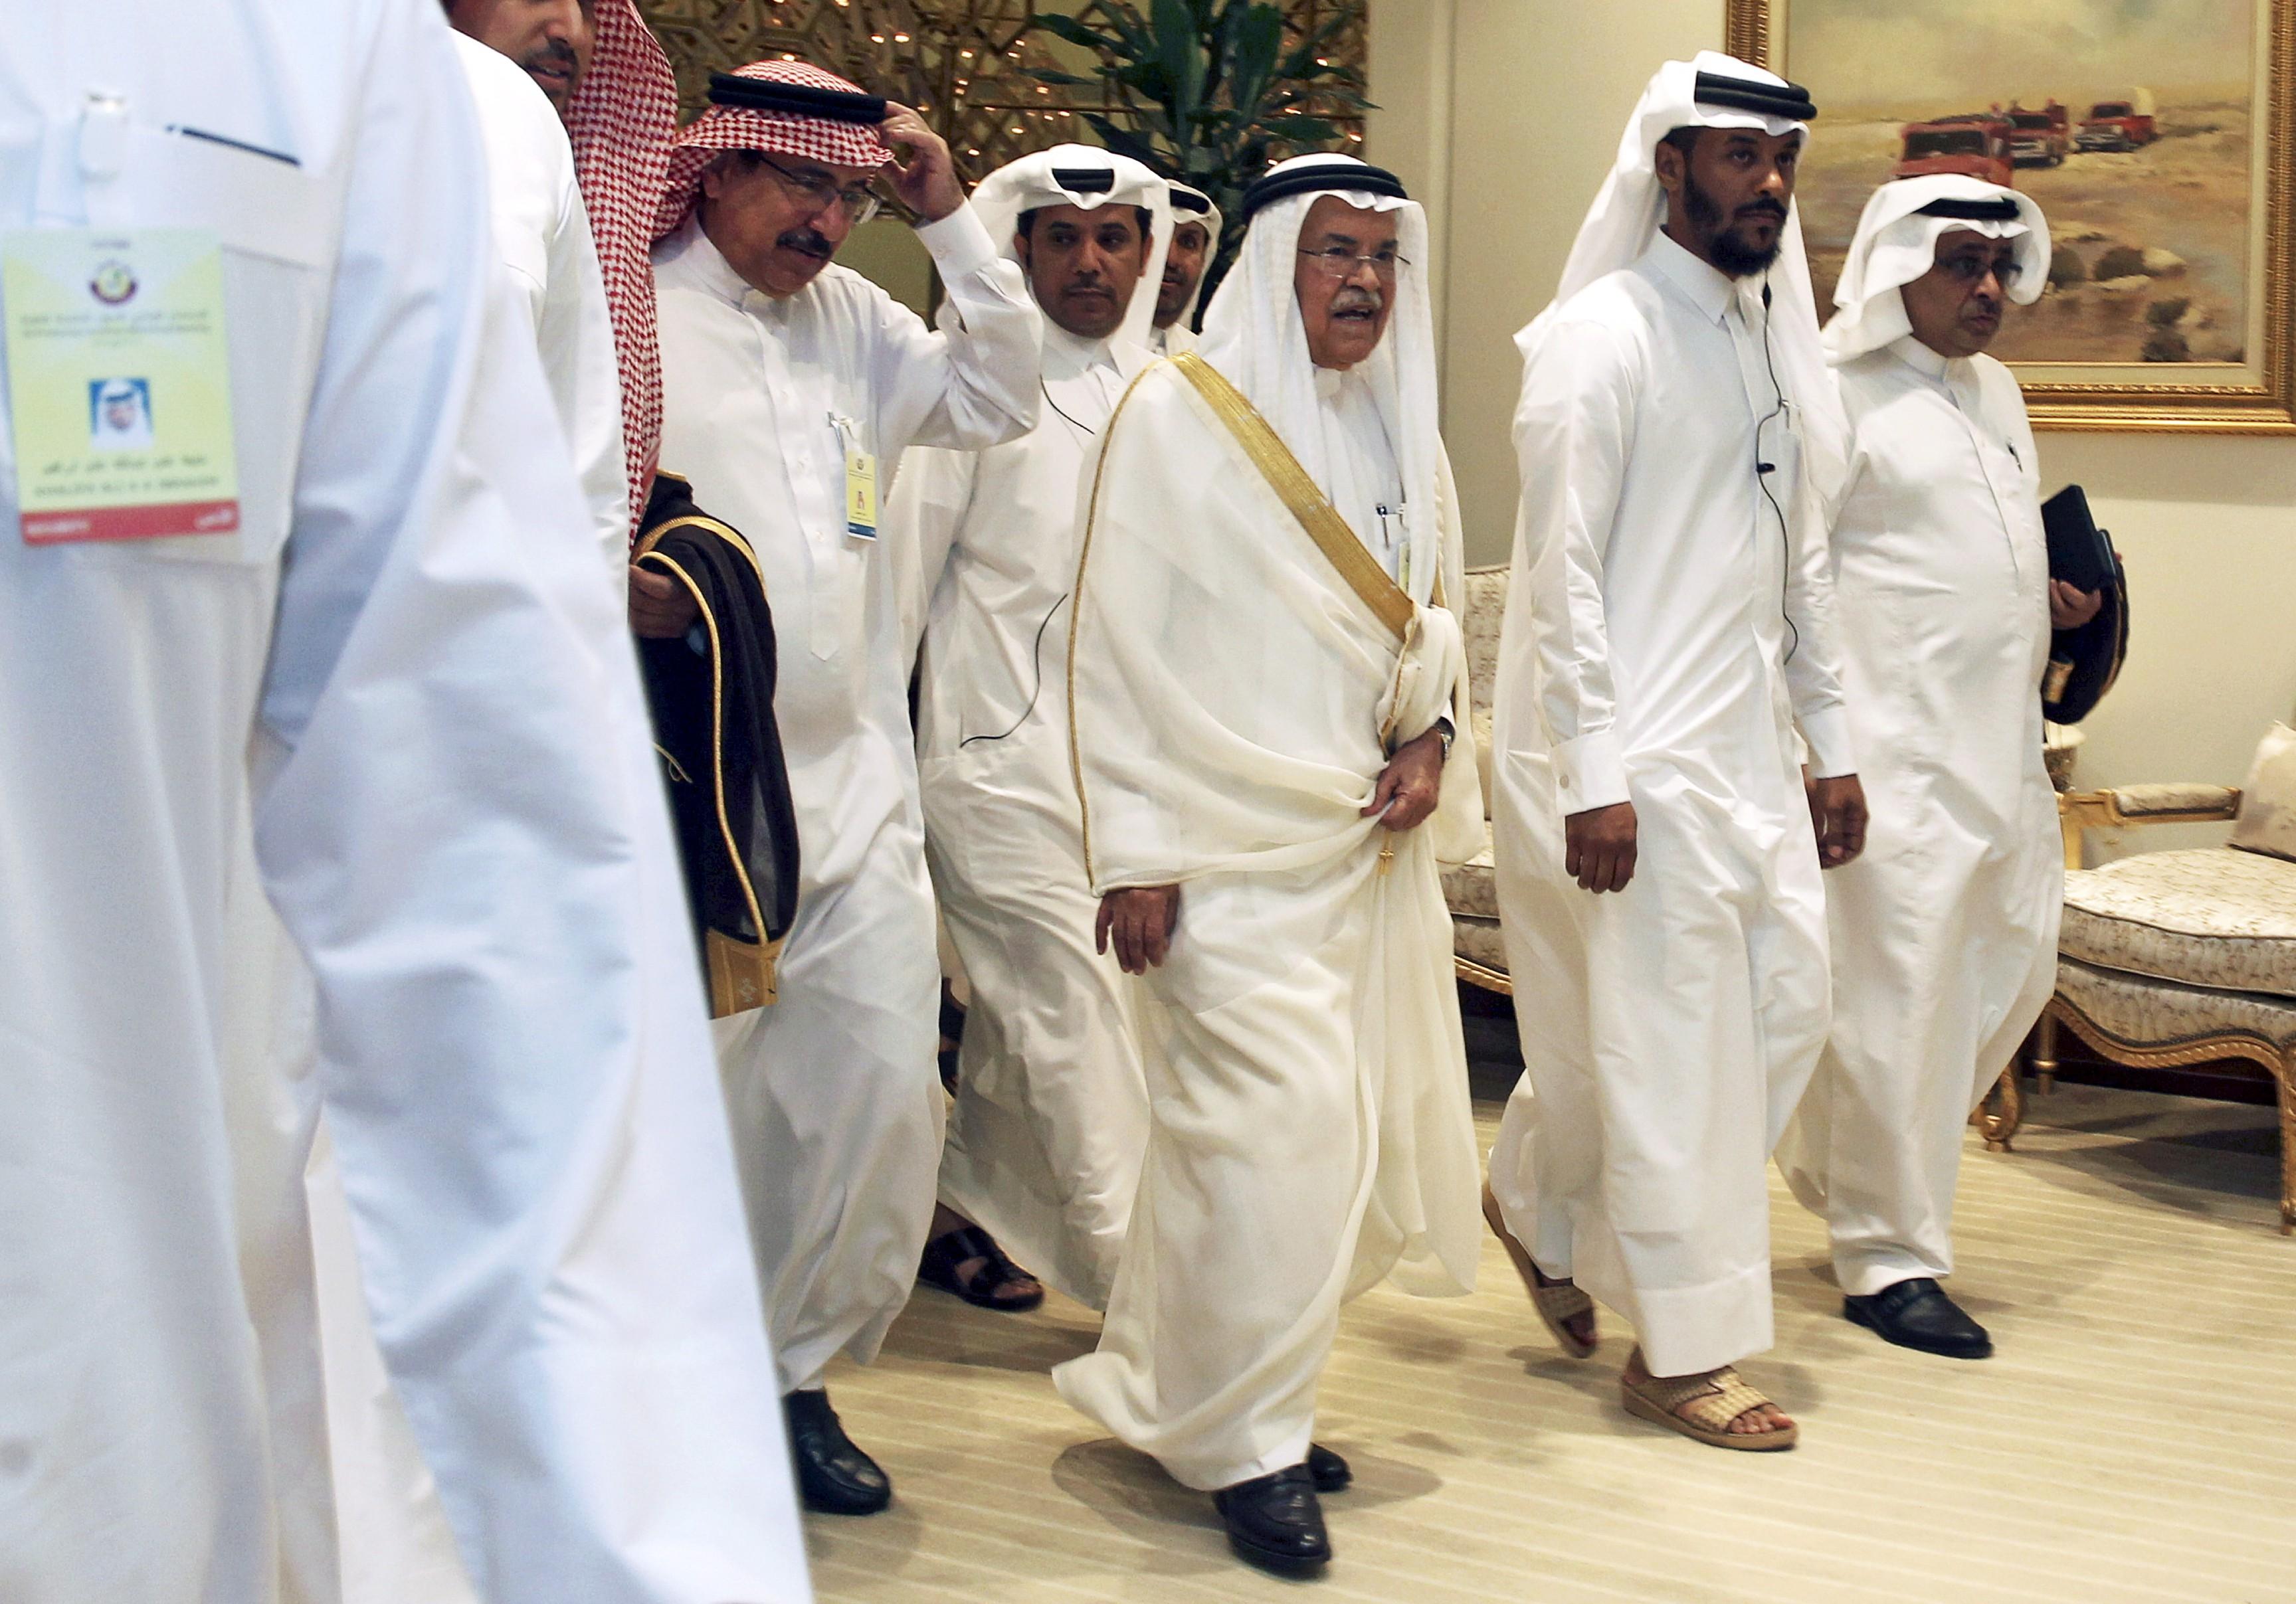 Saudi Arabia's Oil Minister Ali al-Naimi arrives to a meeting between OPEC and non-OPEC oil producers, in Doha, Qatar April 17, 2016.